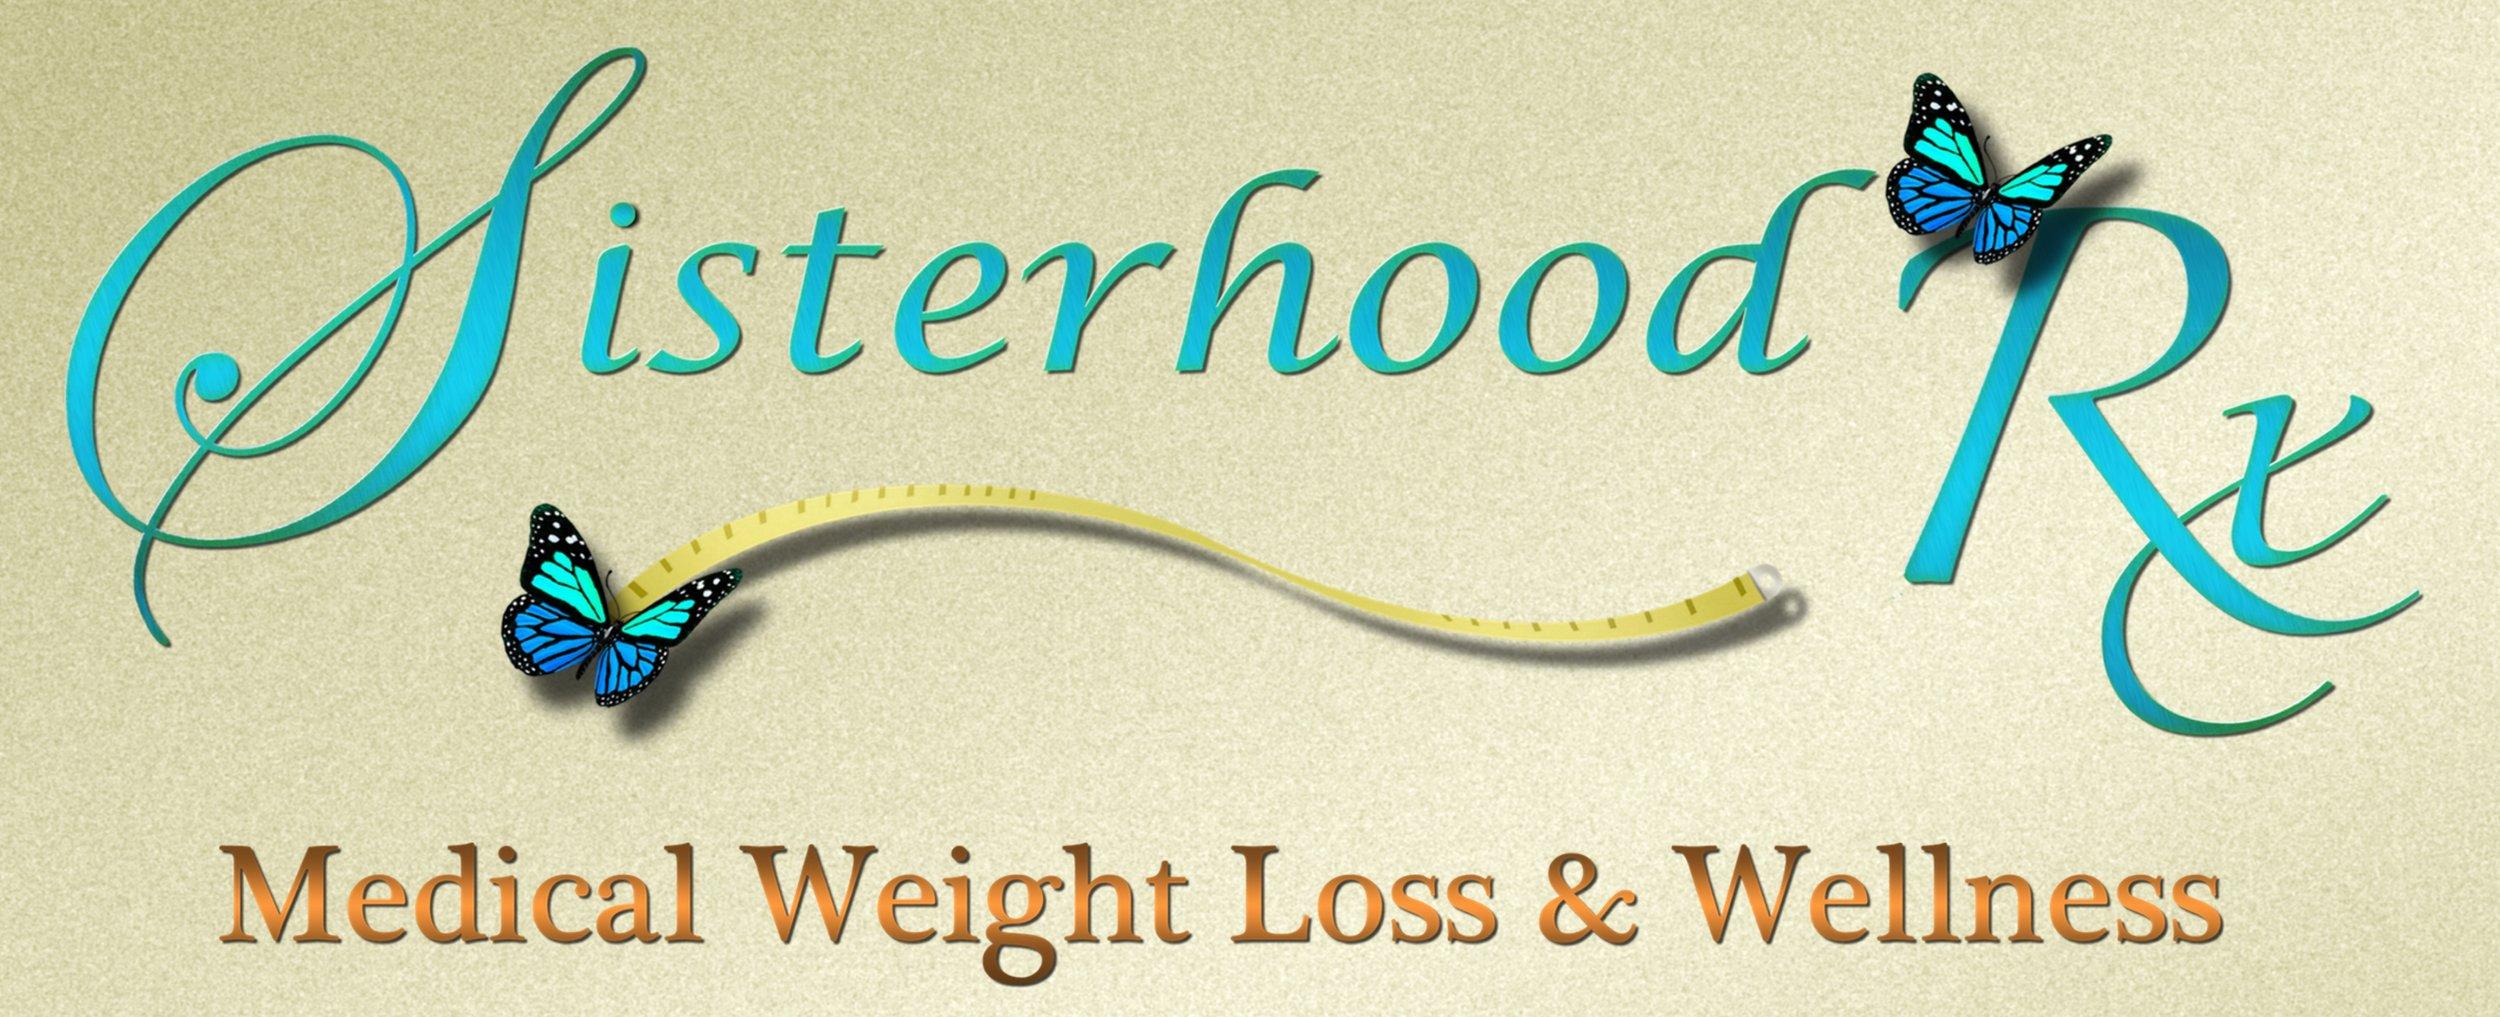 Sisterhood Rx Medical Weight Loss